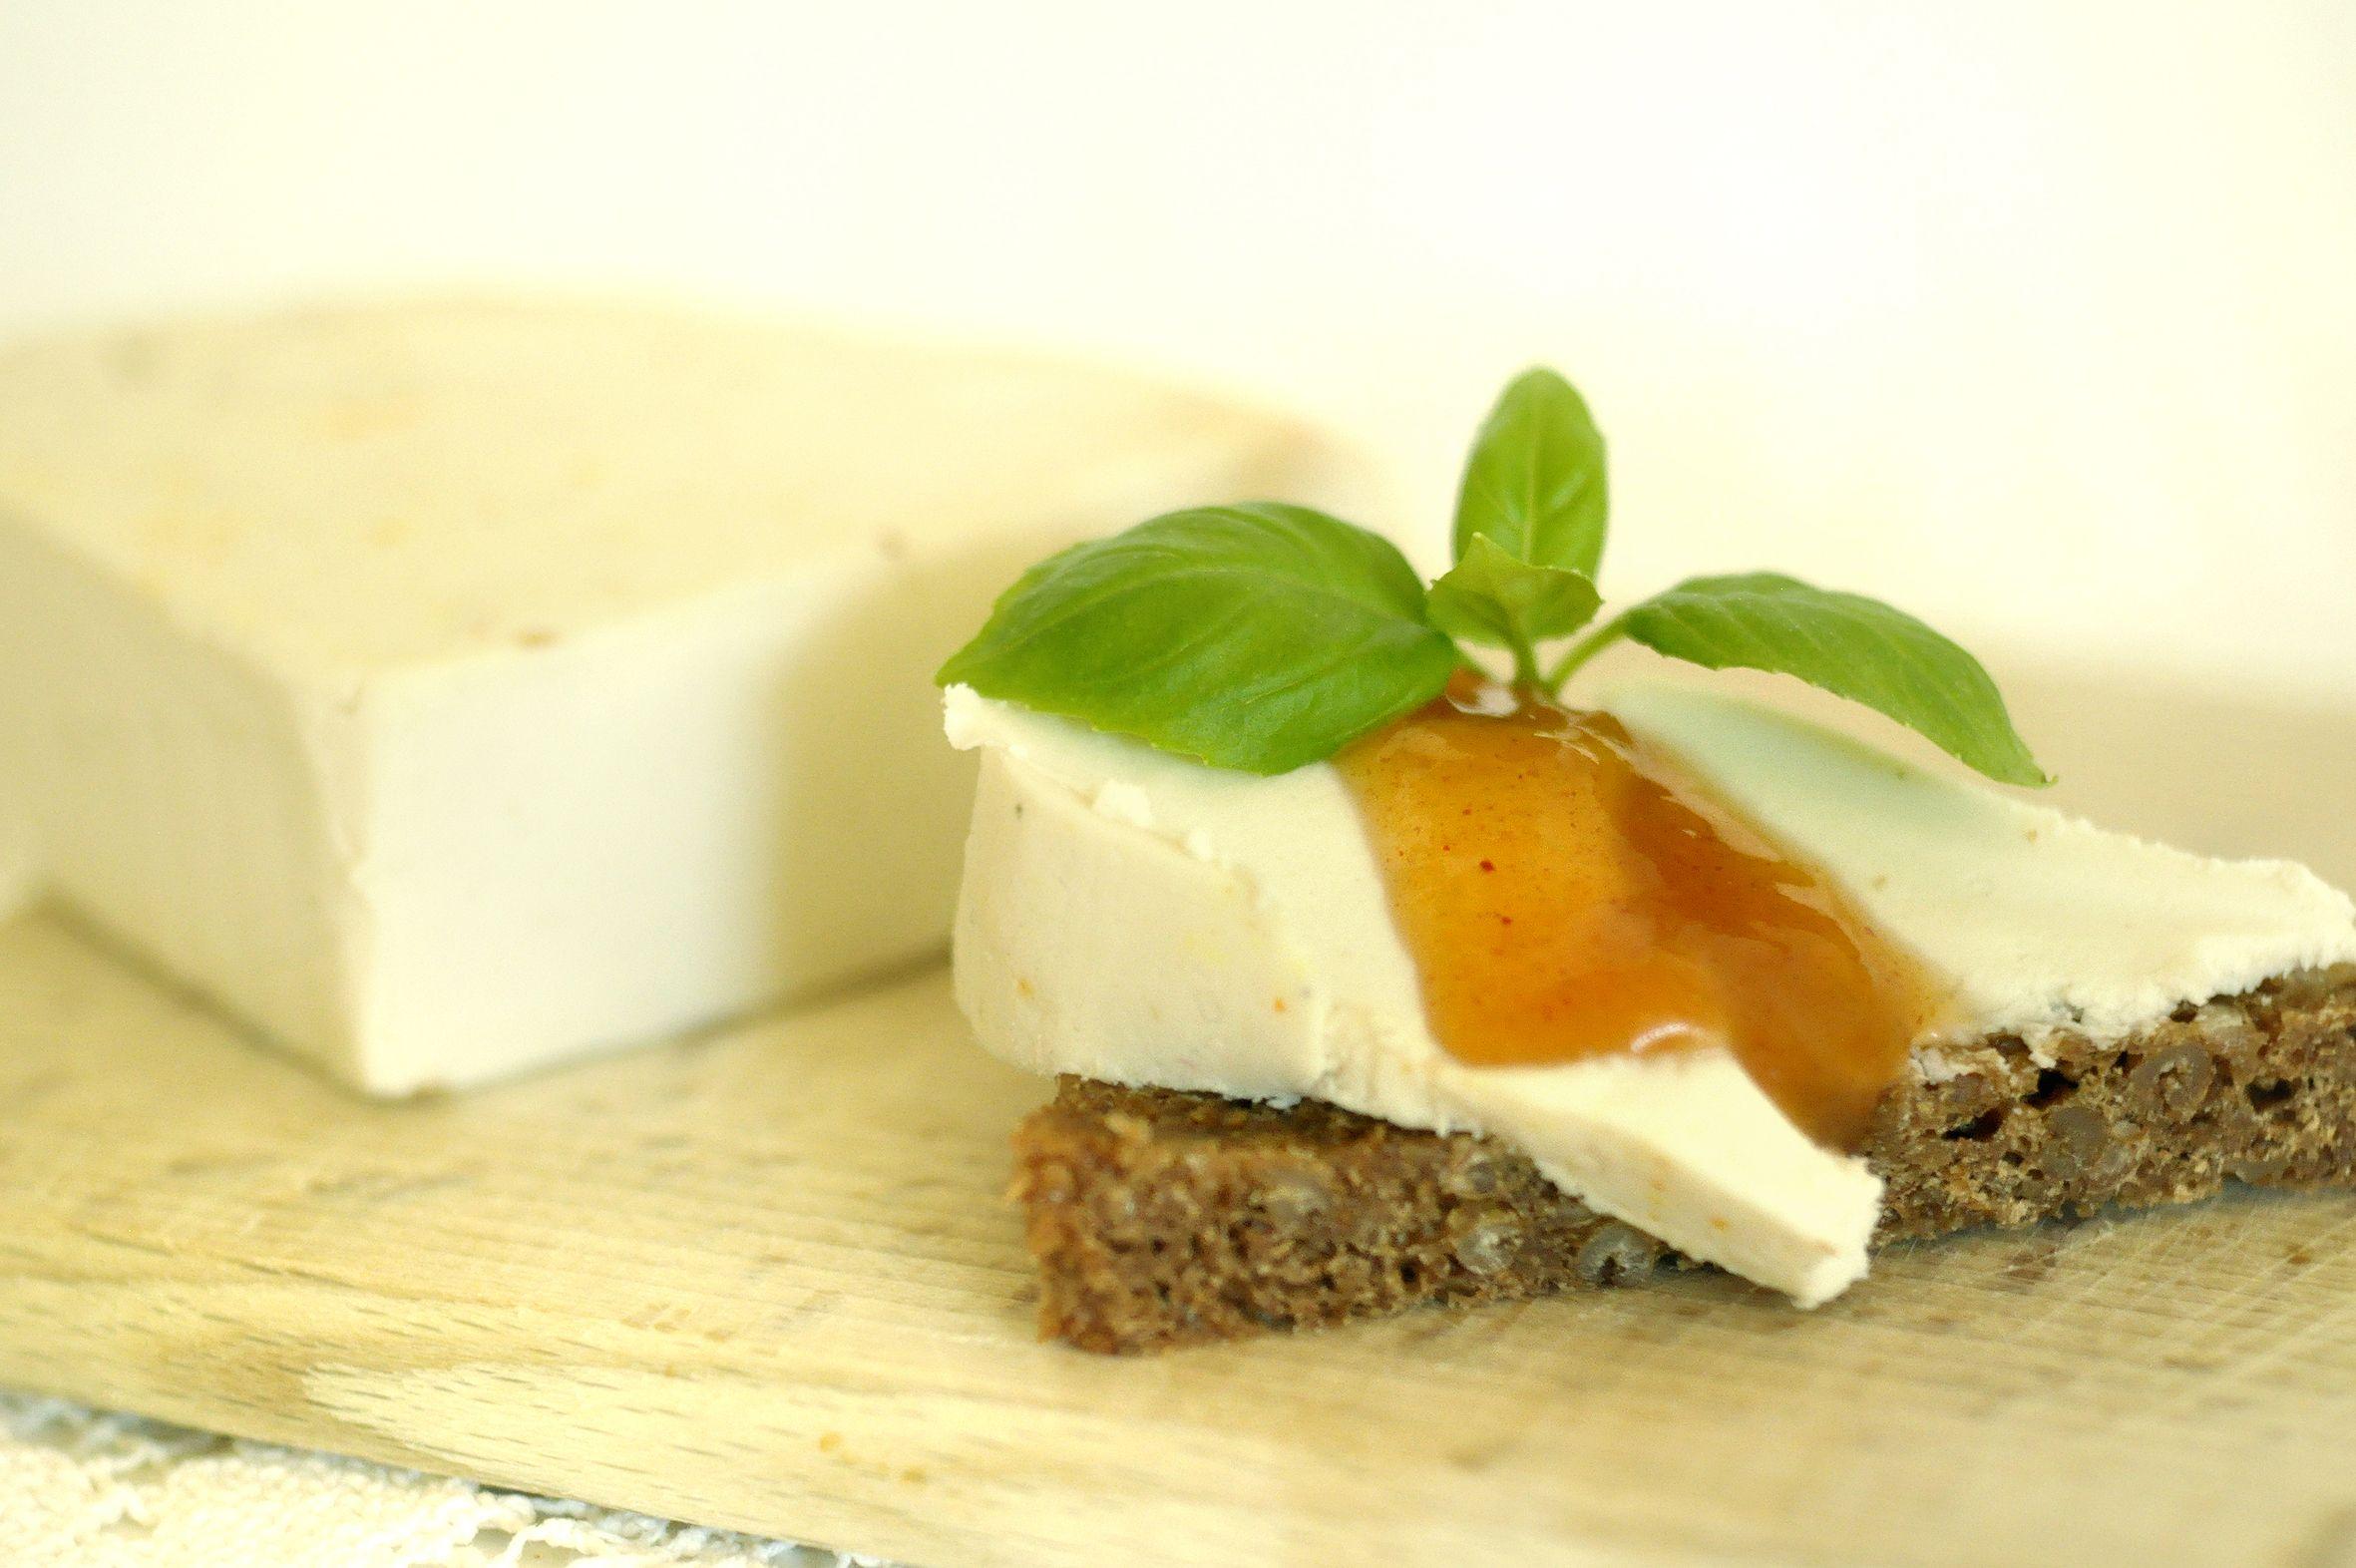 Cashew Brie Yum Vegan Cheese Recipes Food Processor Recipes Vegan Cheese